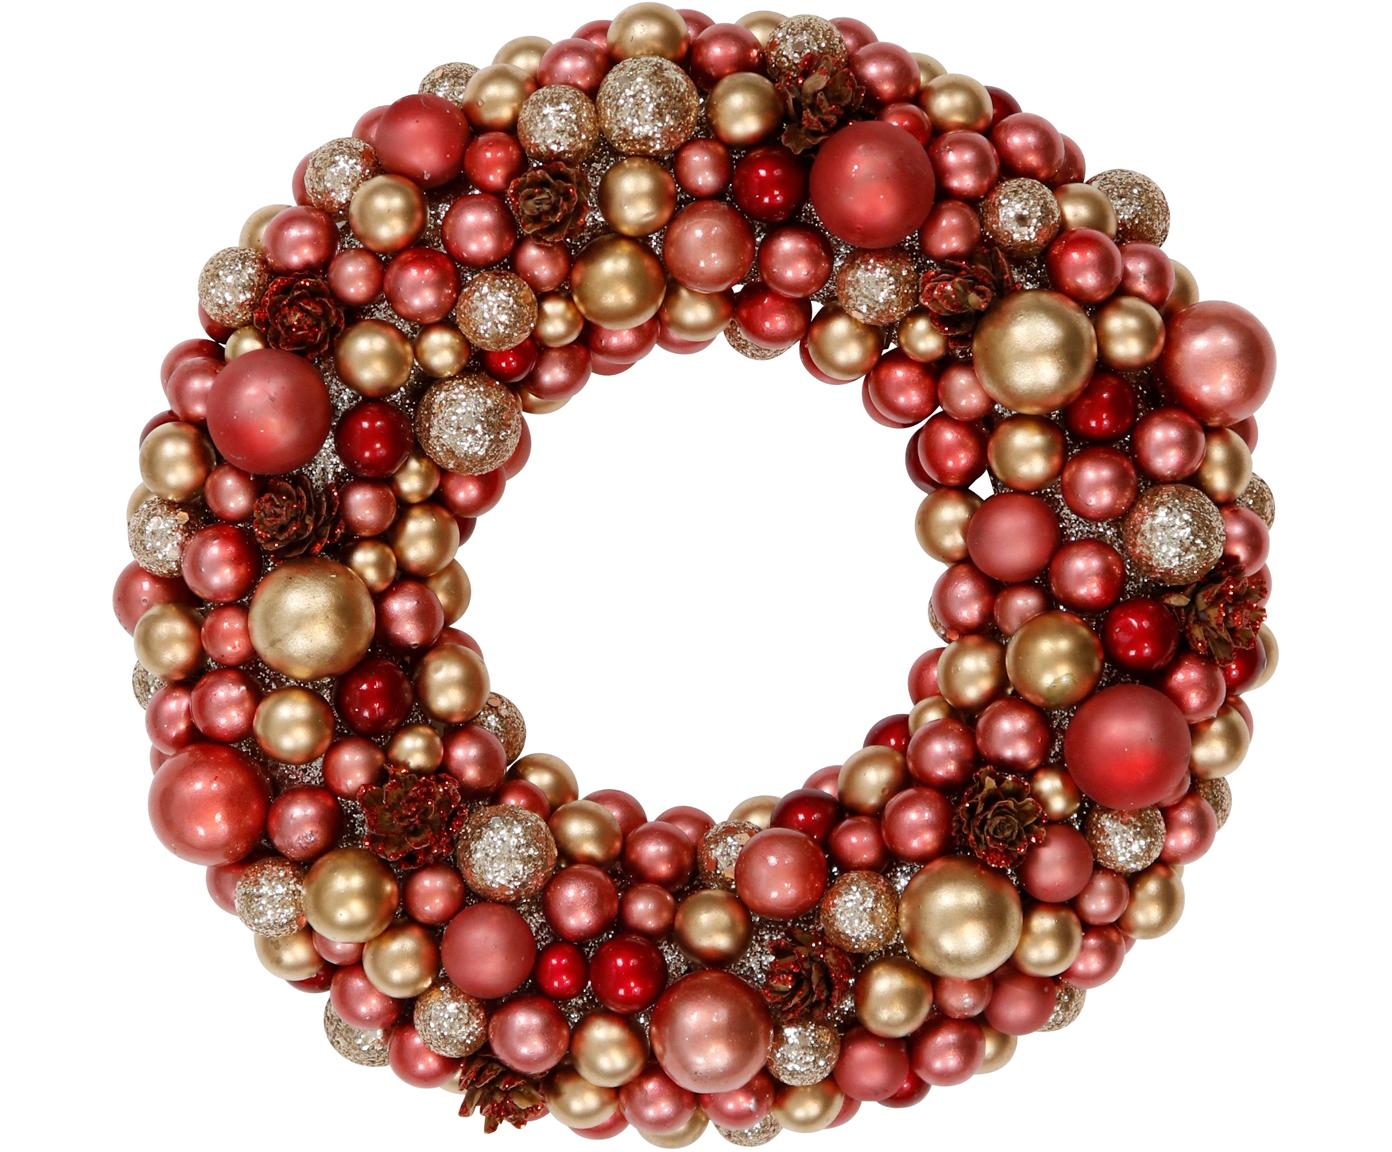 Corona navideña Festivity, Plástico, espuma de poliestireno, Rojo, dorado, Ø 25 x Al 6 cm